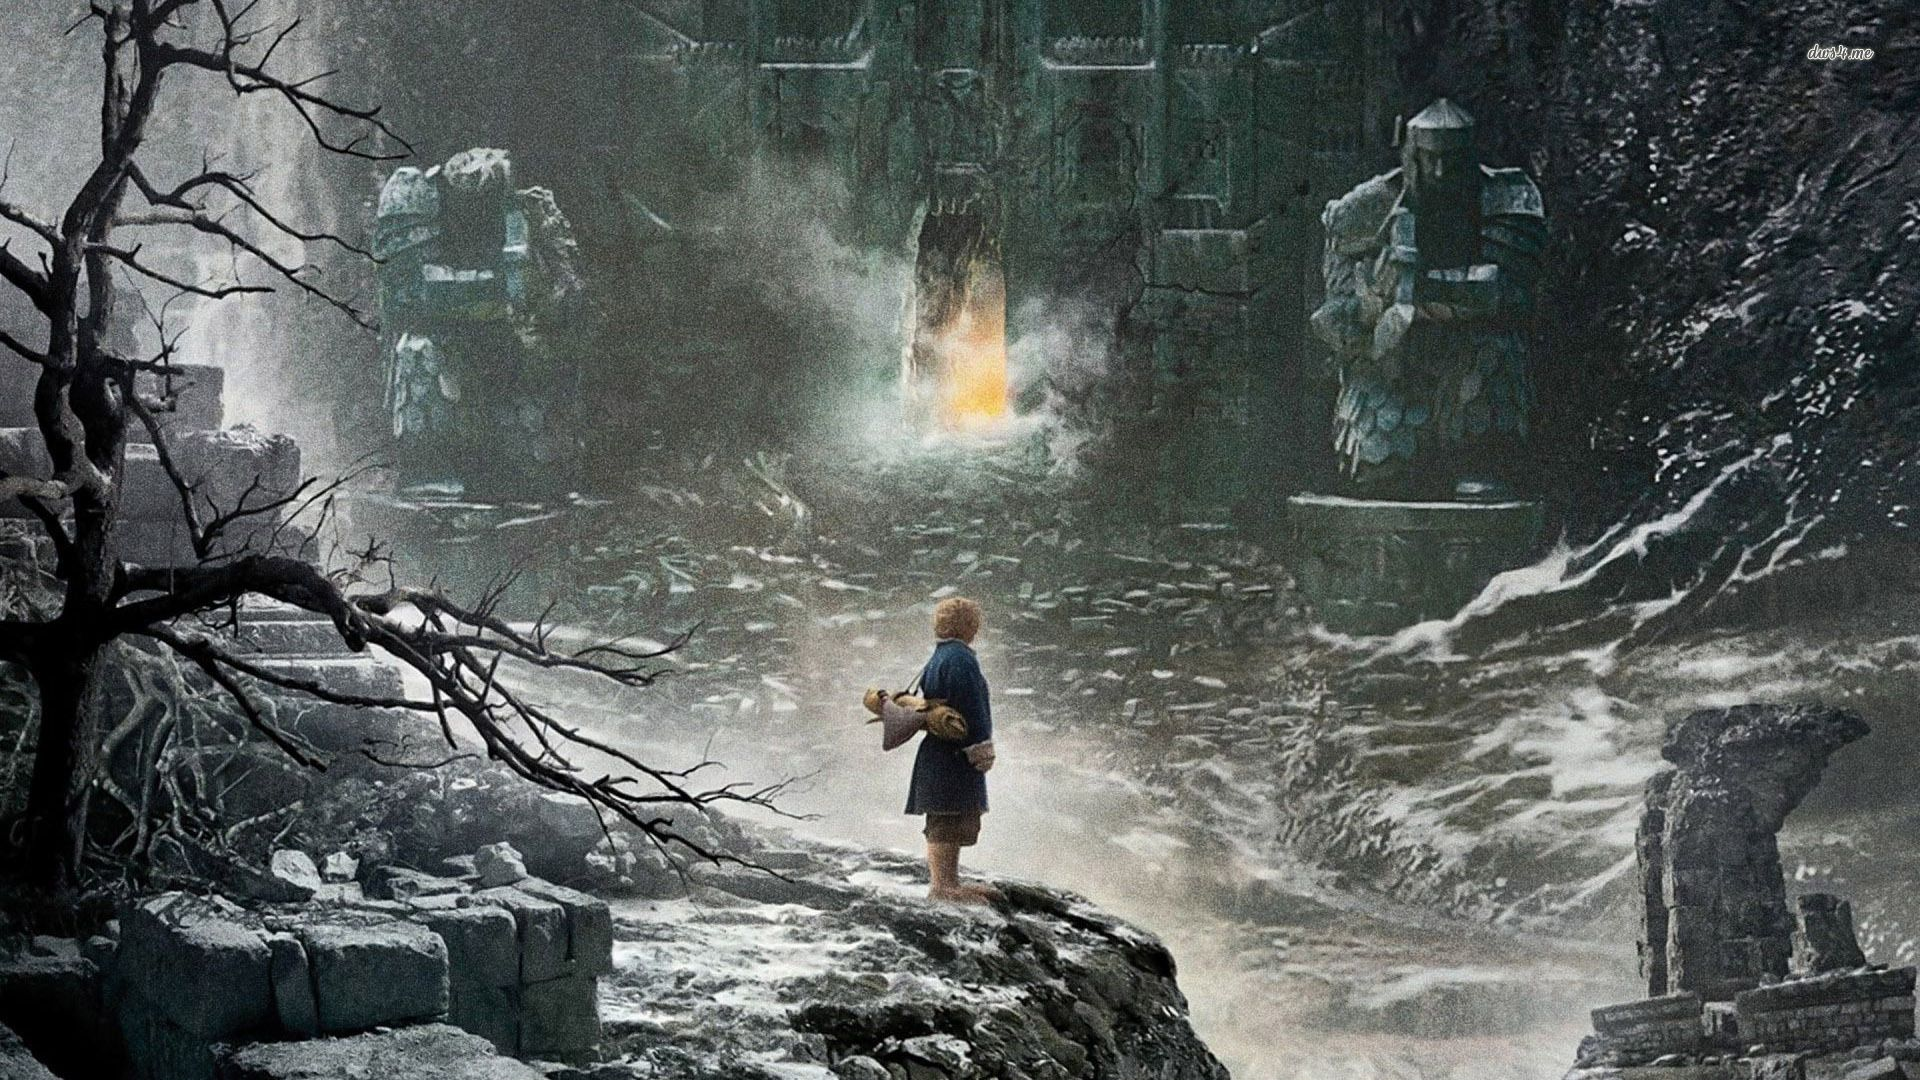 The Hobbit Hd Backgrounds Hobbit Desolation Of Smaug Desolation